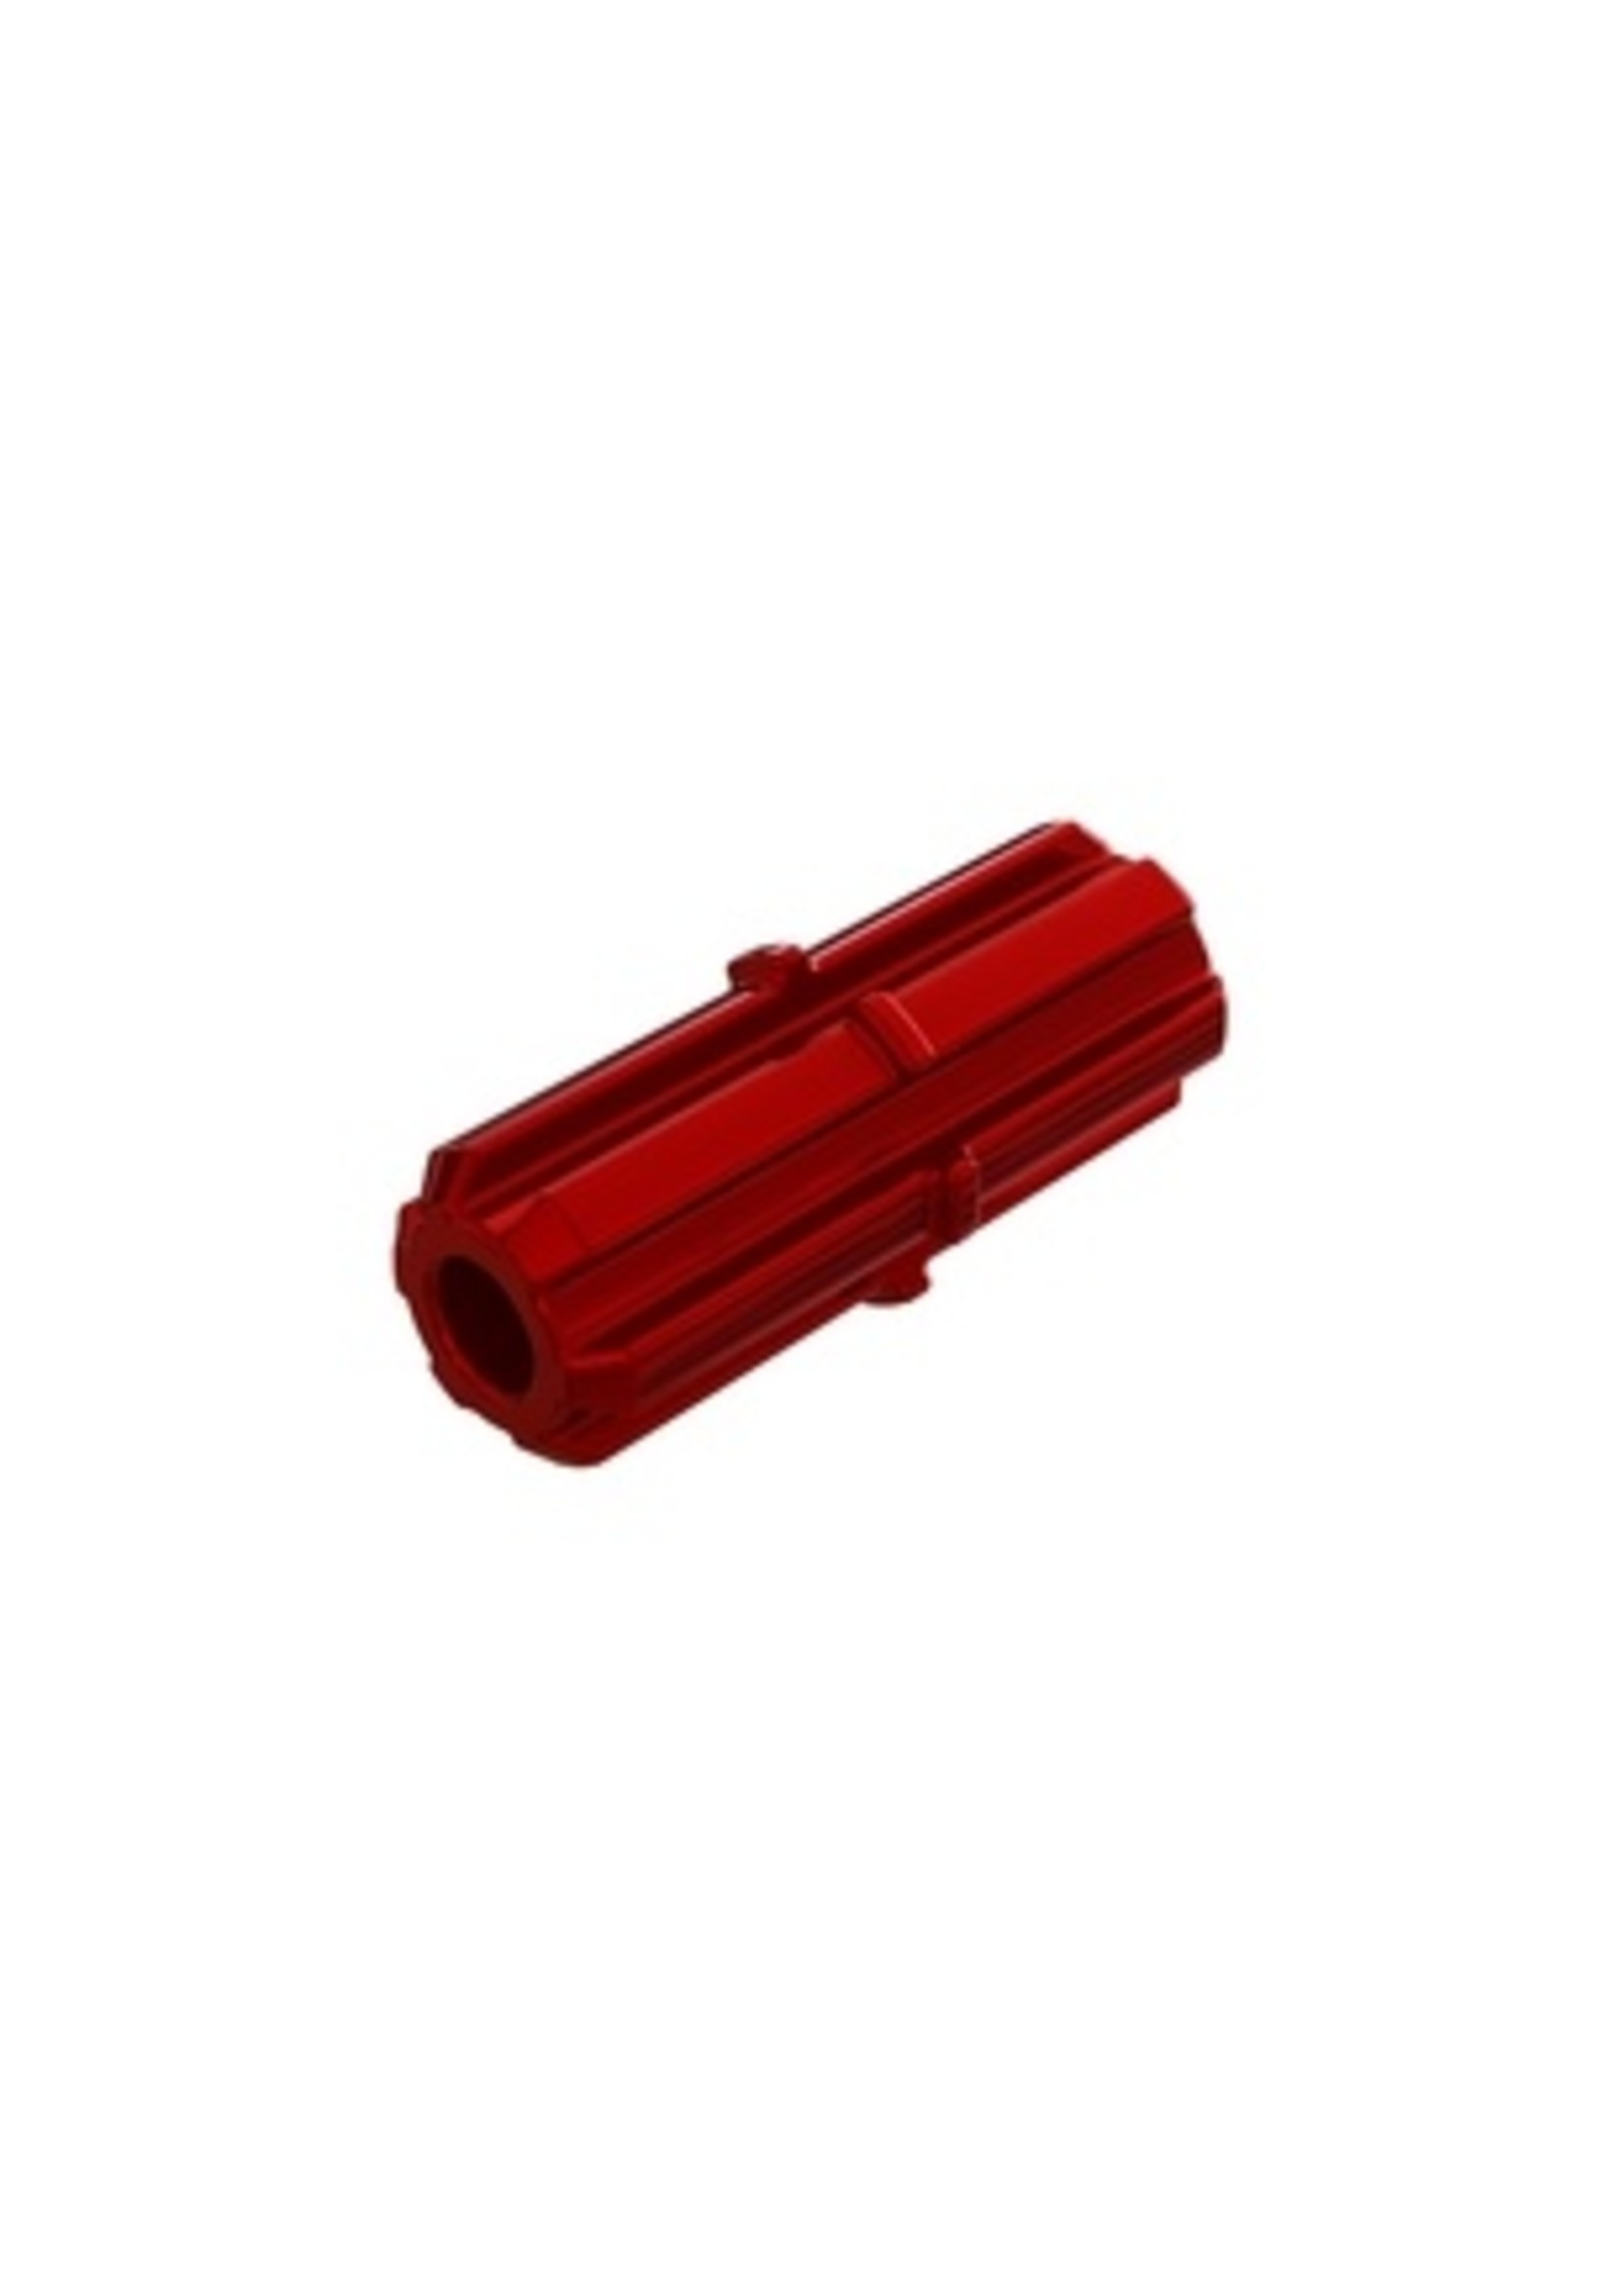 ARRMA AR310881 Arrma Slipper Shaft Red BLX 3S